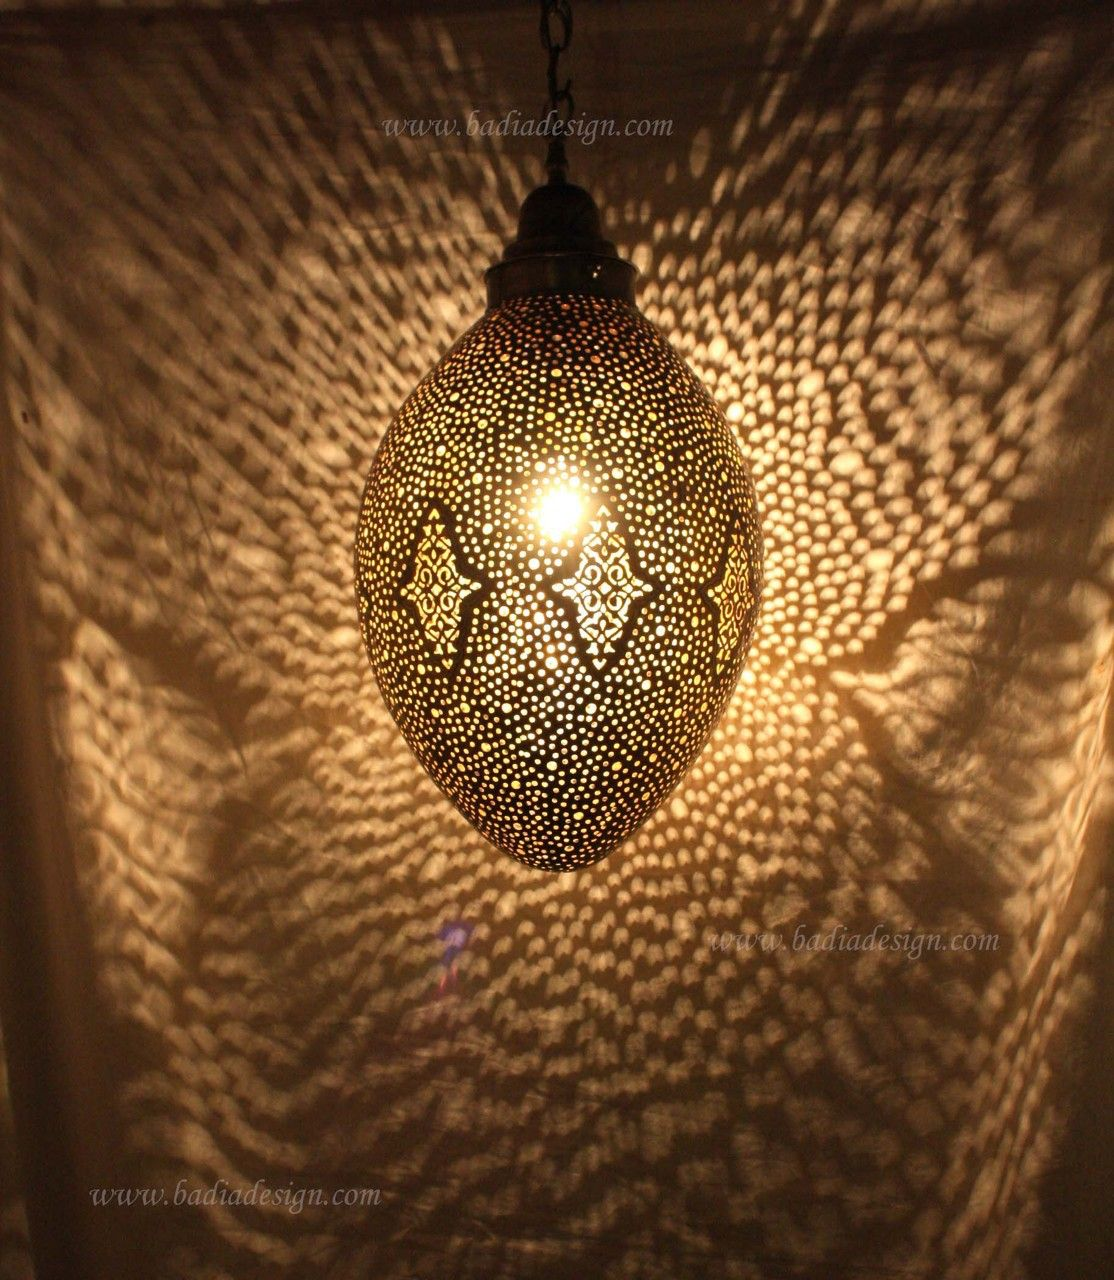 Badia Design Inc Store   Hanging Brass Lantern   LL095, $869.00 (http:/